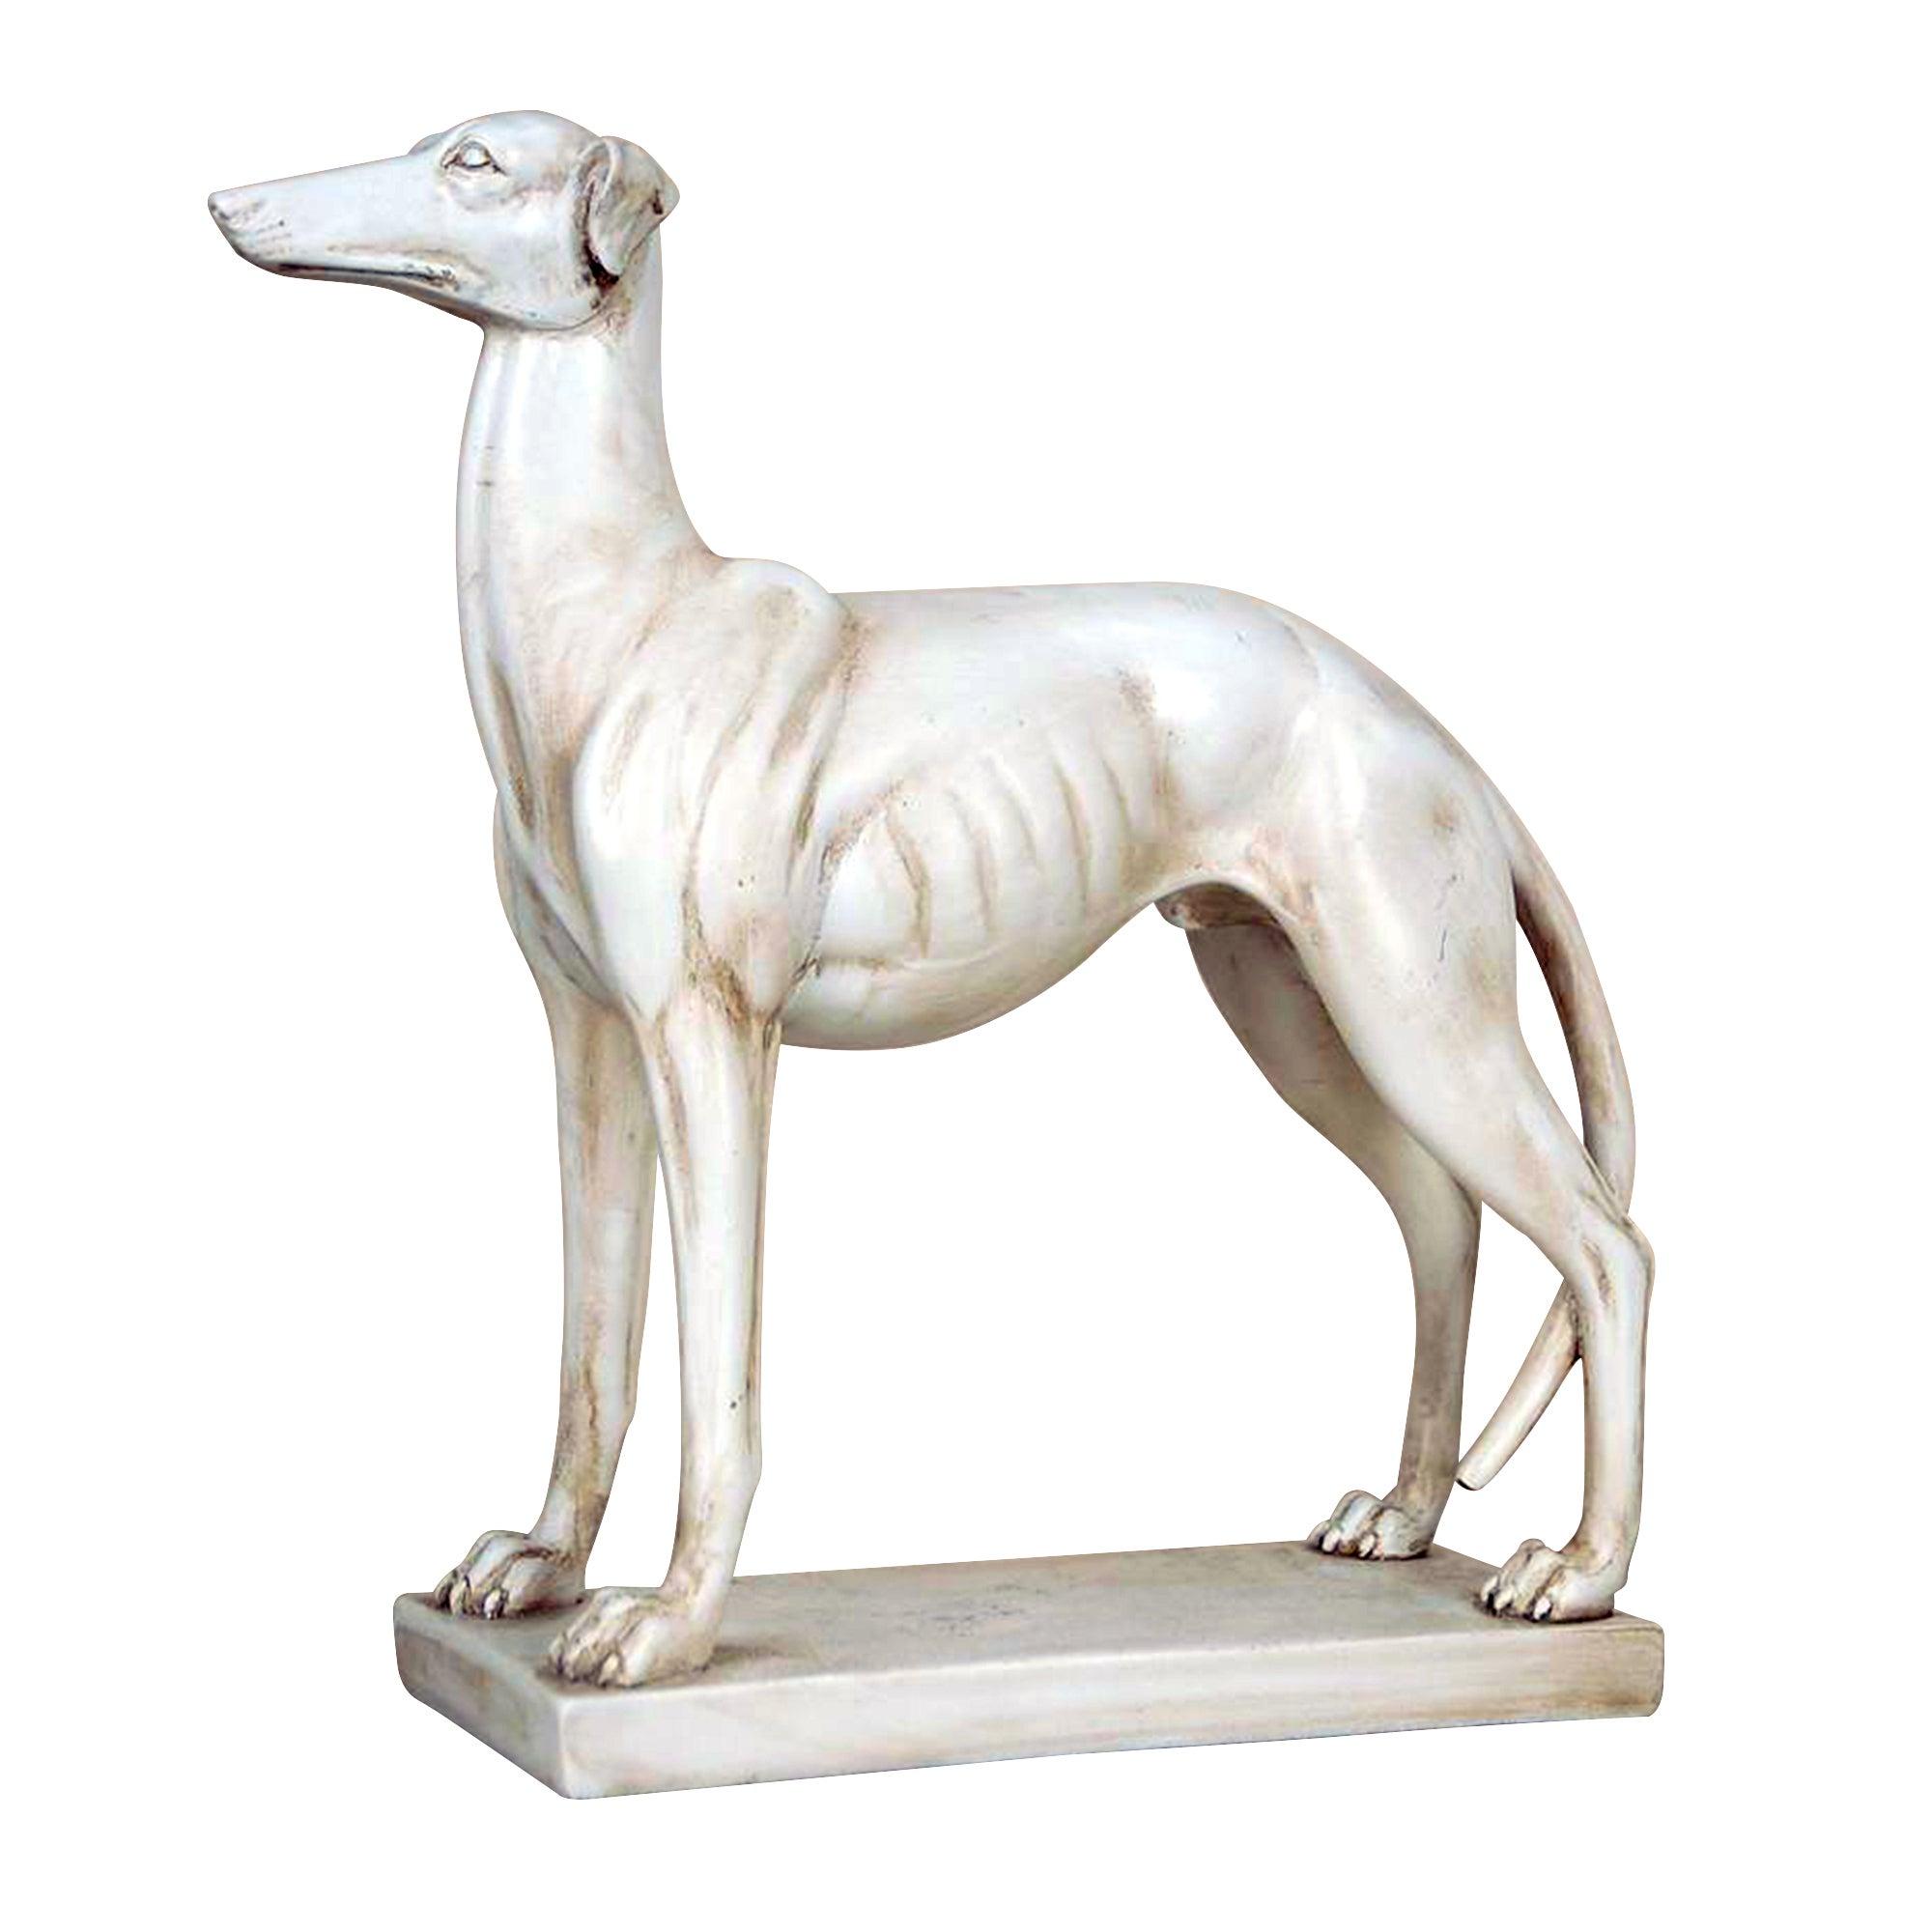 Dorma Greyhound Ornament